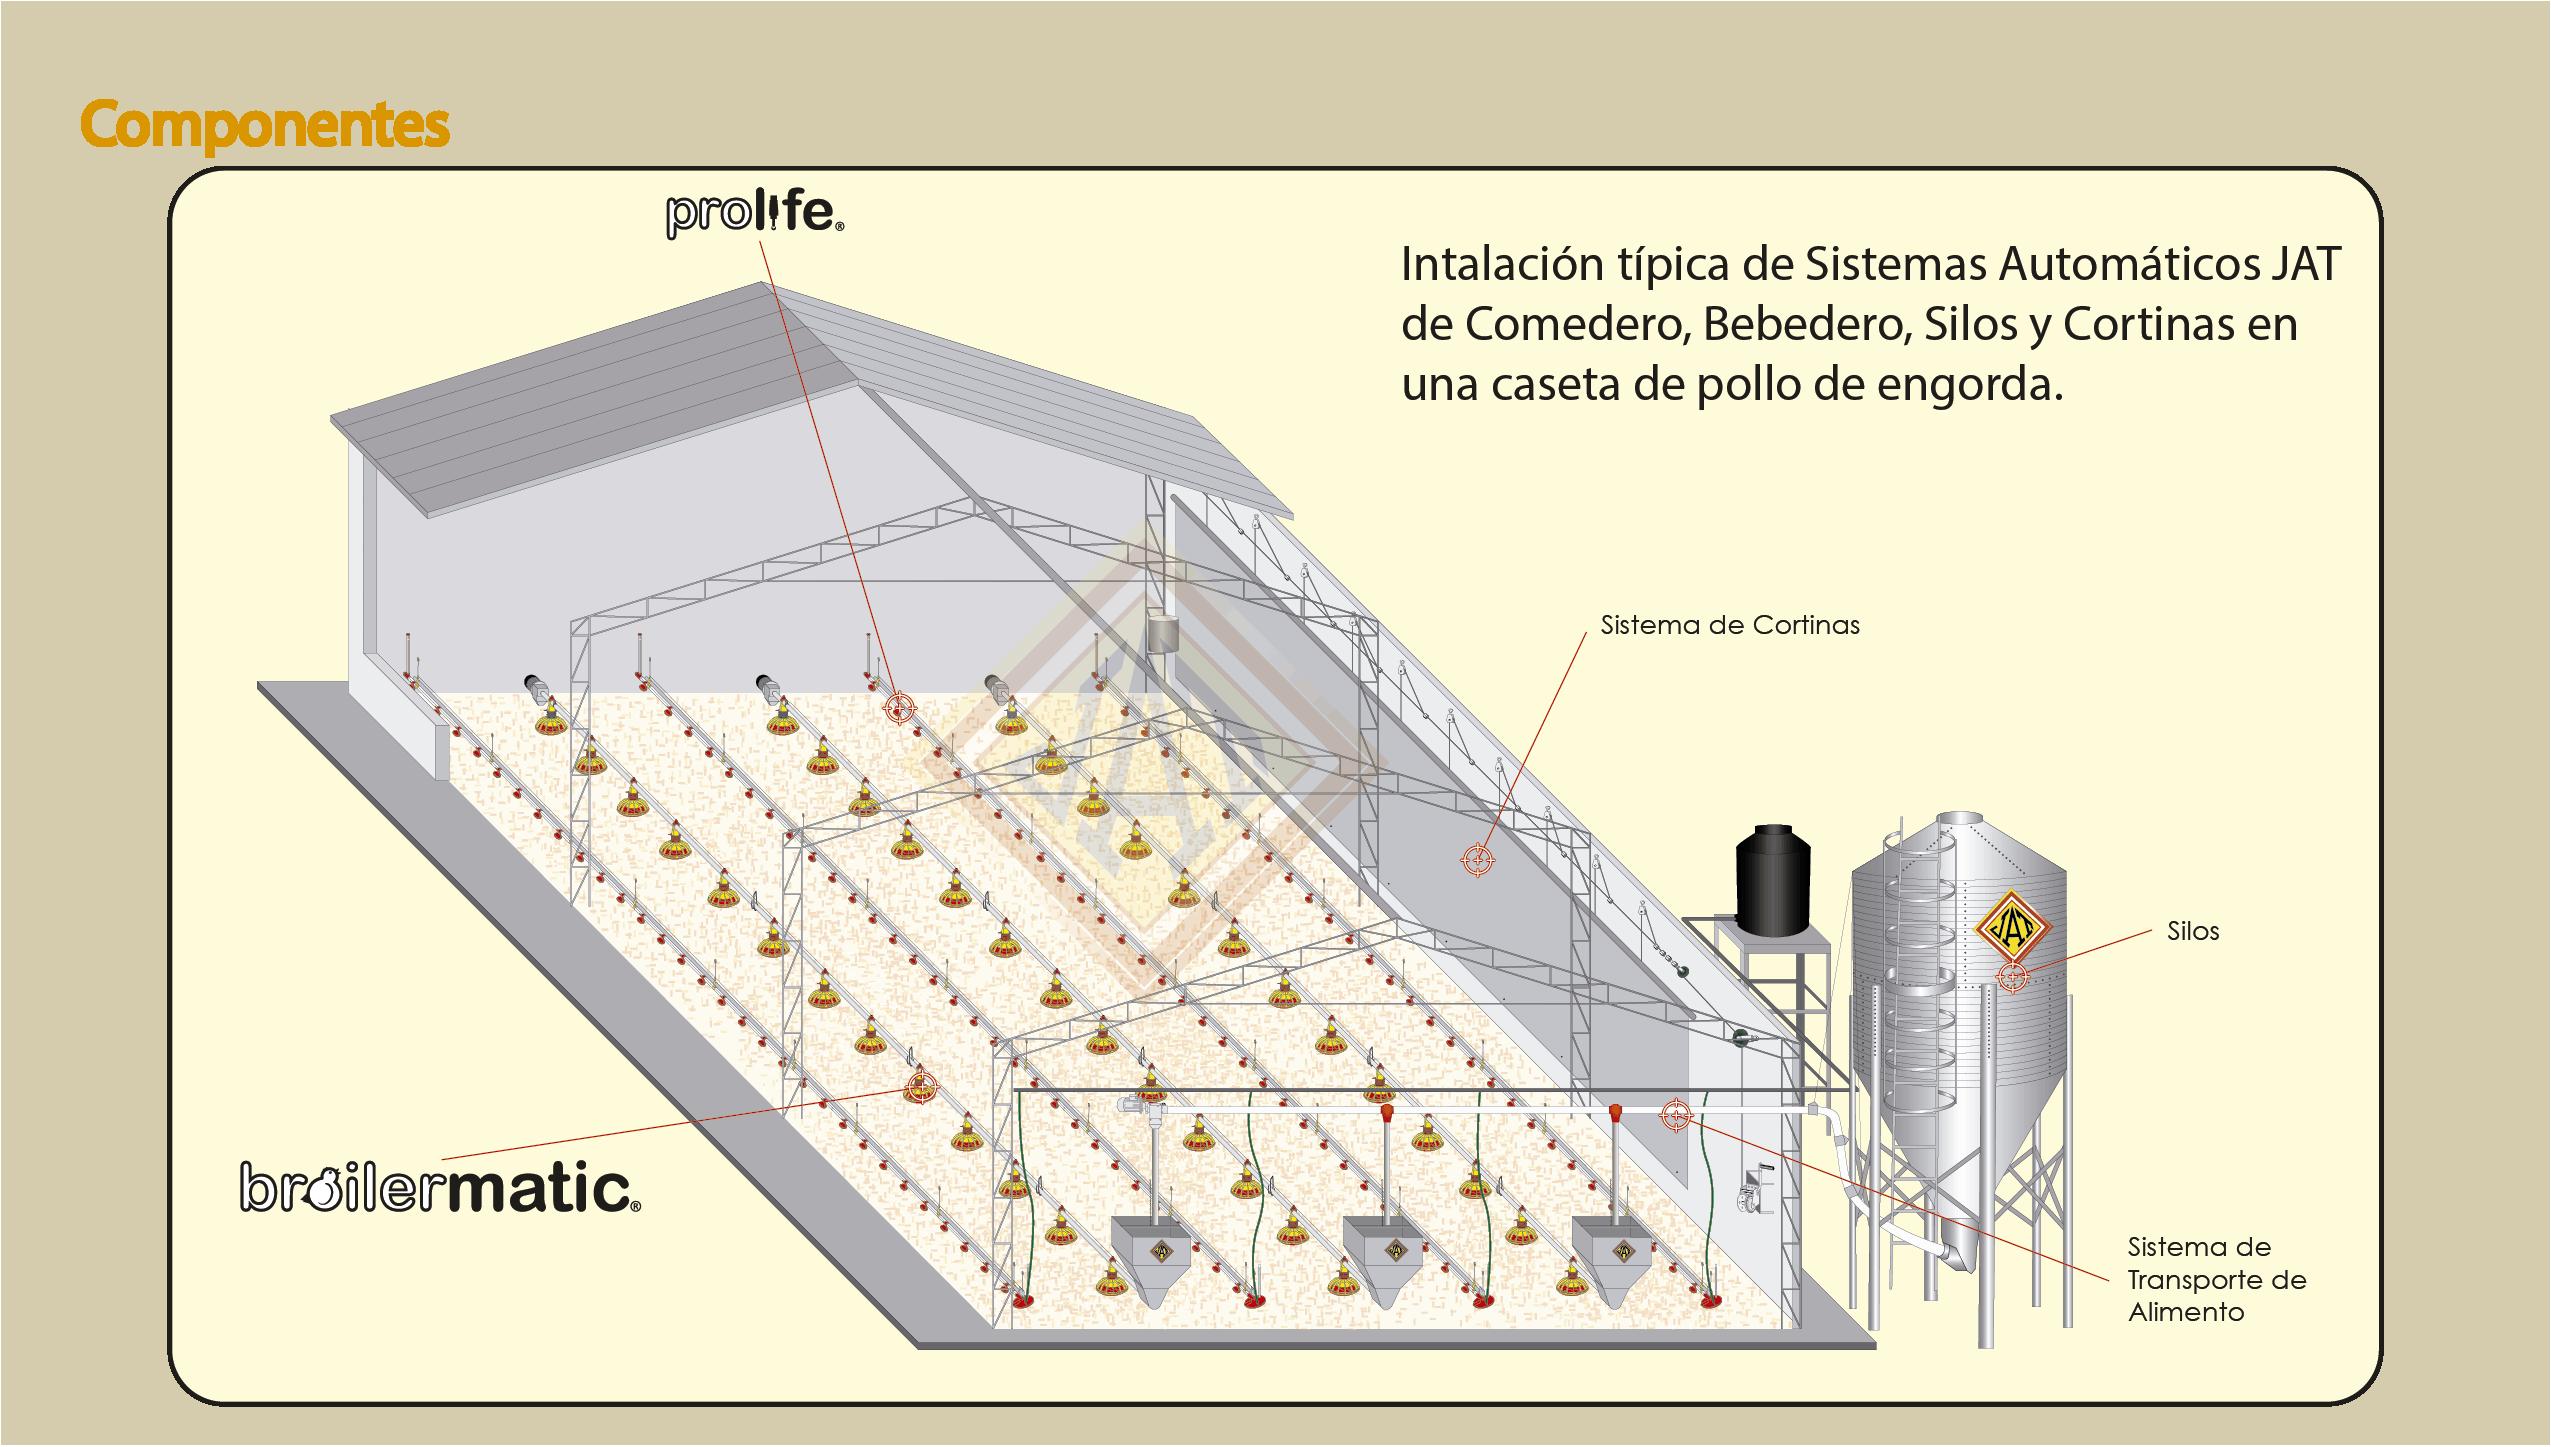 componentes 612x374